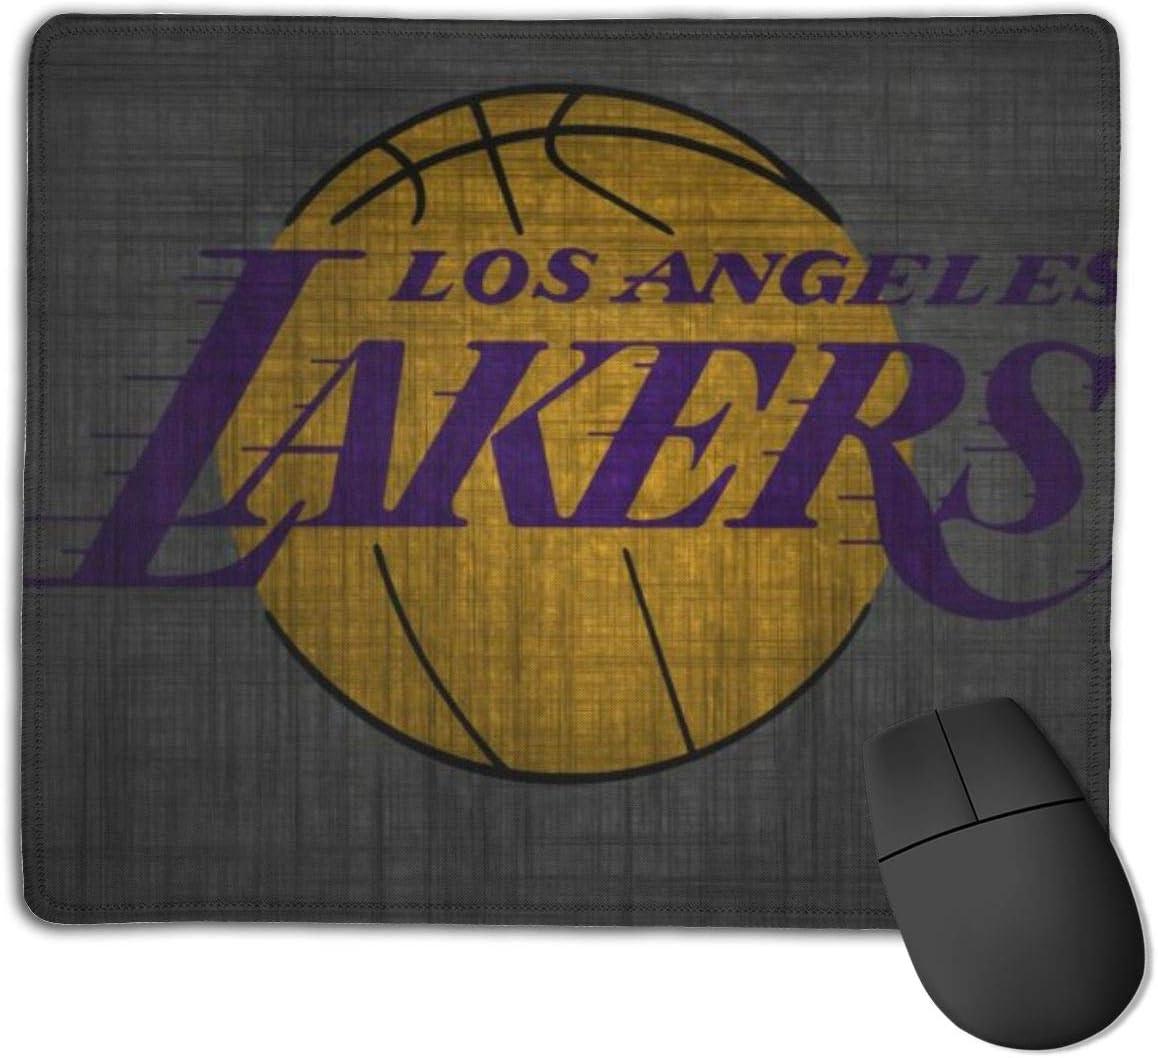 Bucks Basketball Round Mousepad Mouse Pad Great Gift Idea Milwaukee